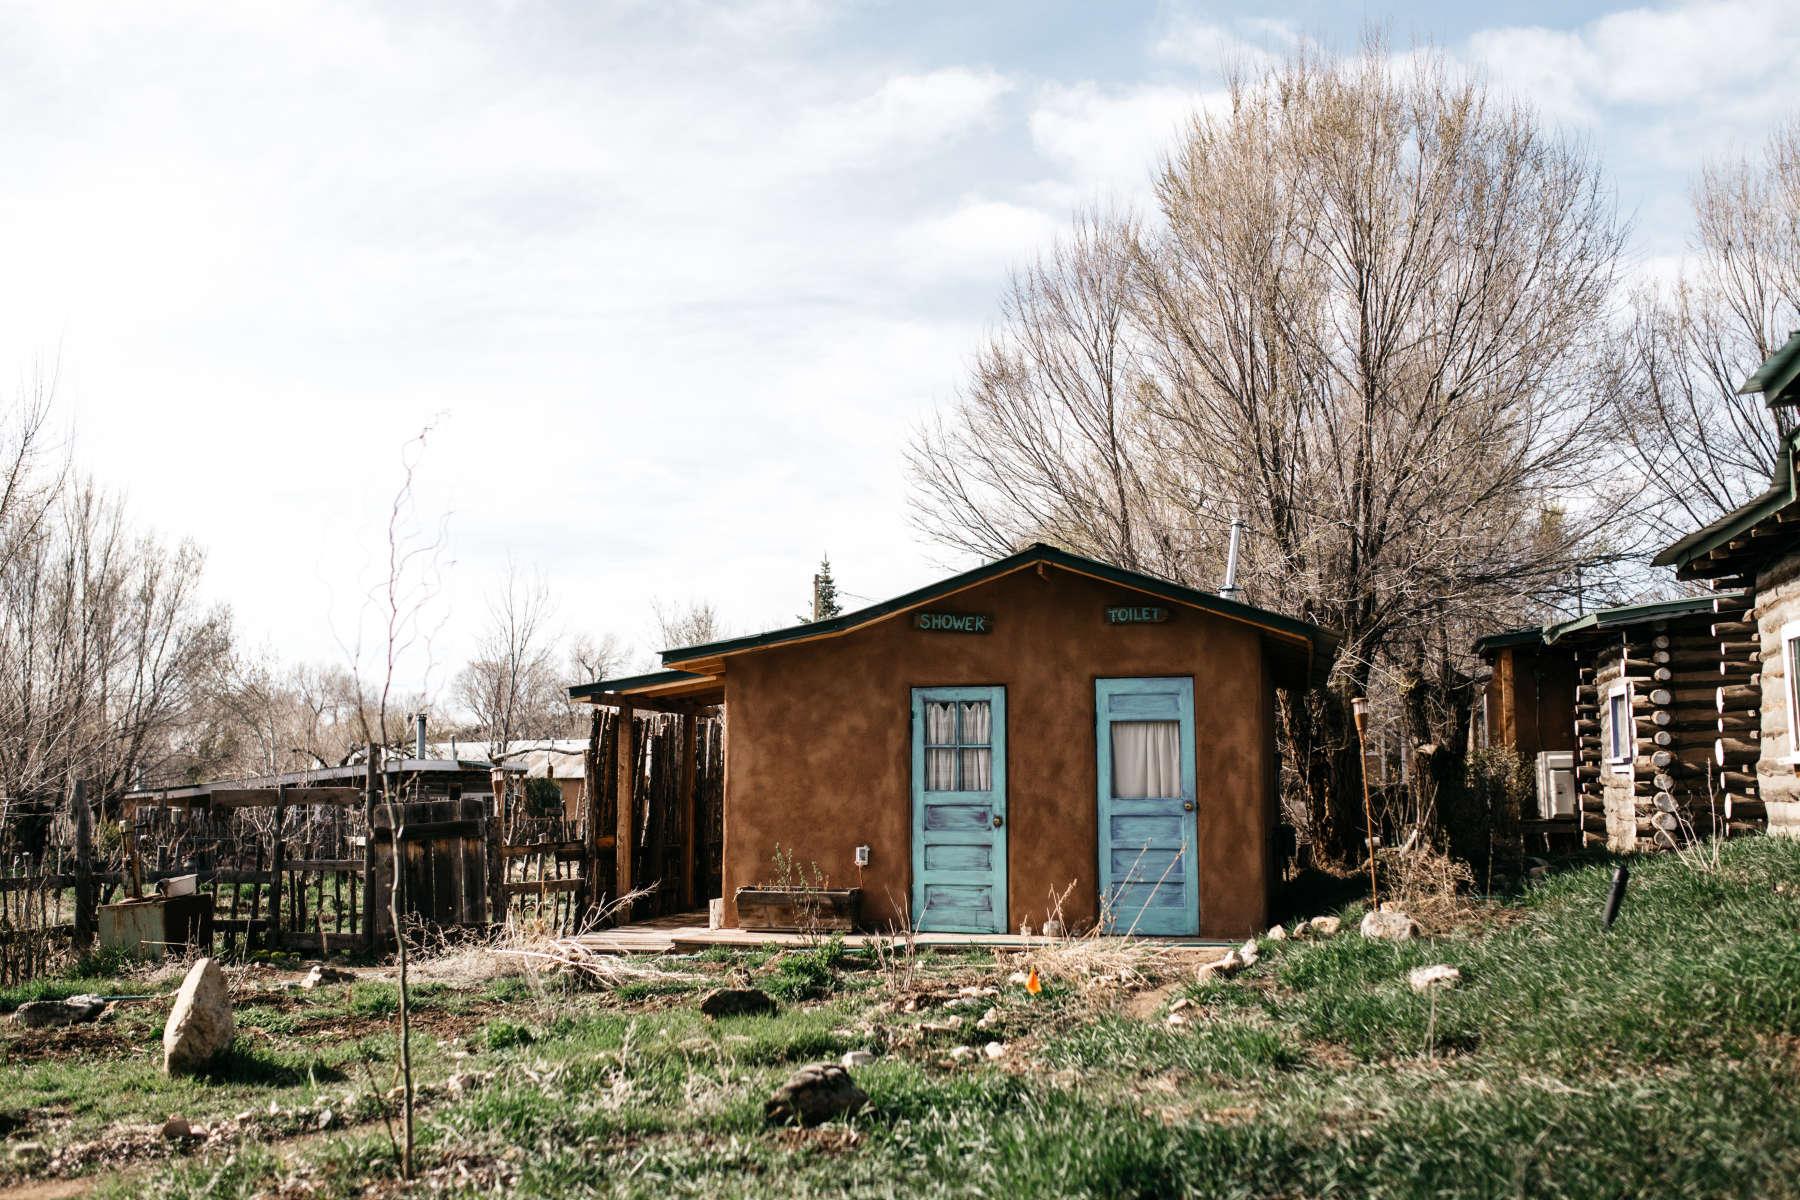 Dh lawrence eco cabin taos goji eco lodge farm nm 1 for Cabins in taos nm